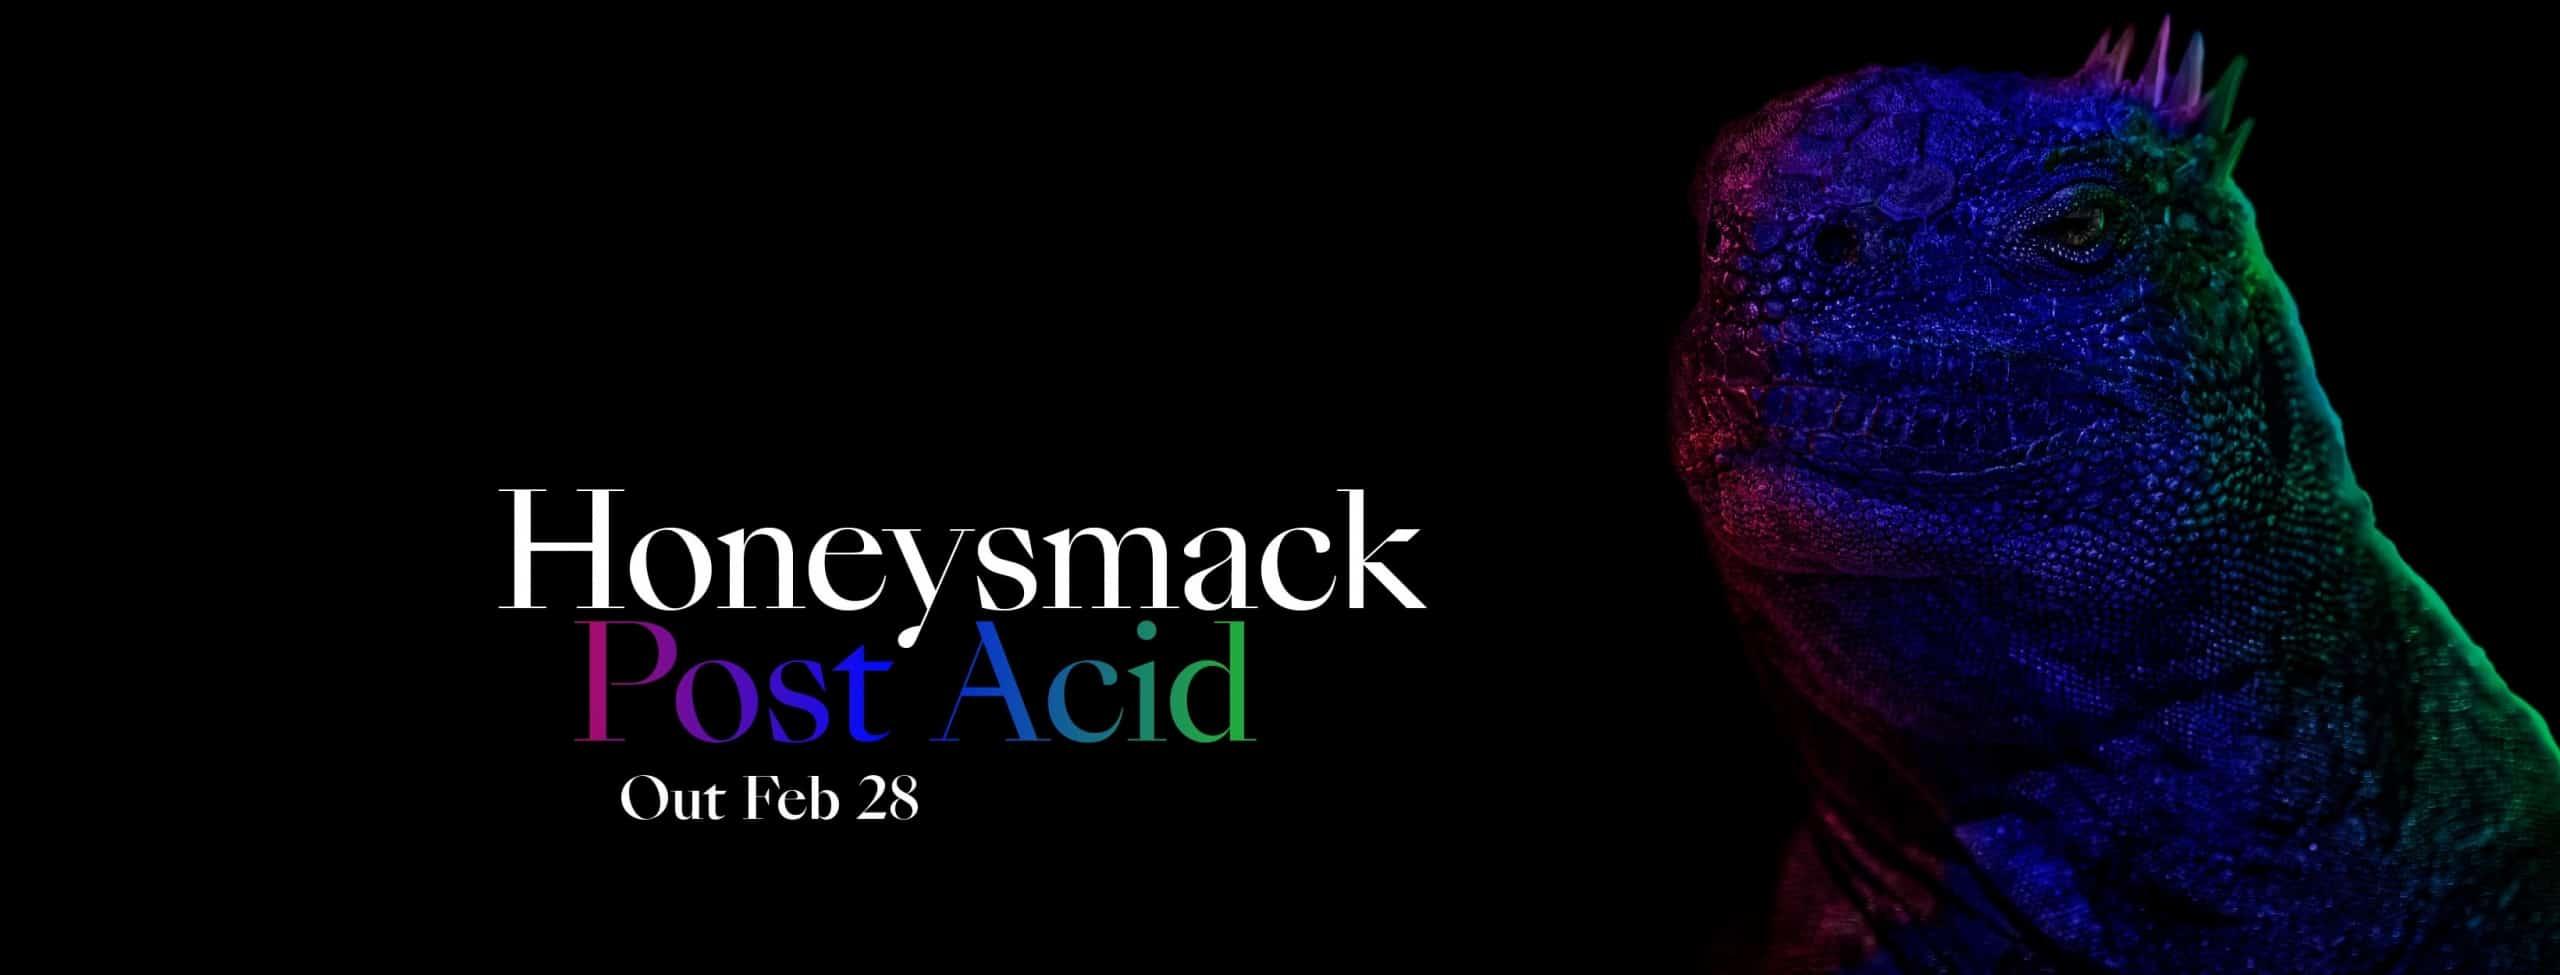 Honeysmack Releases Post Acid